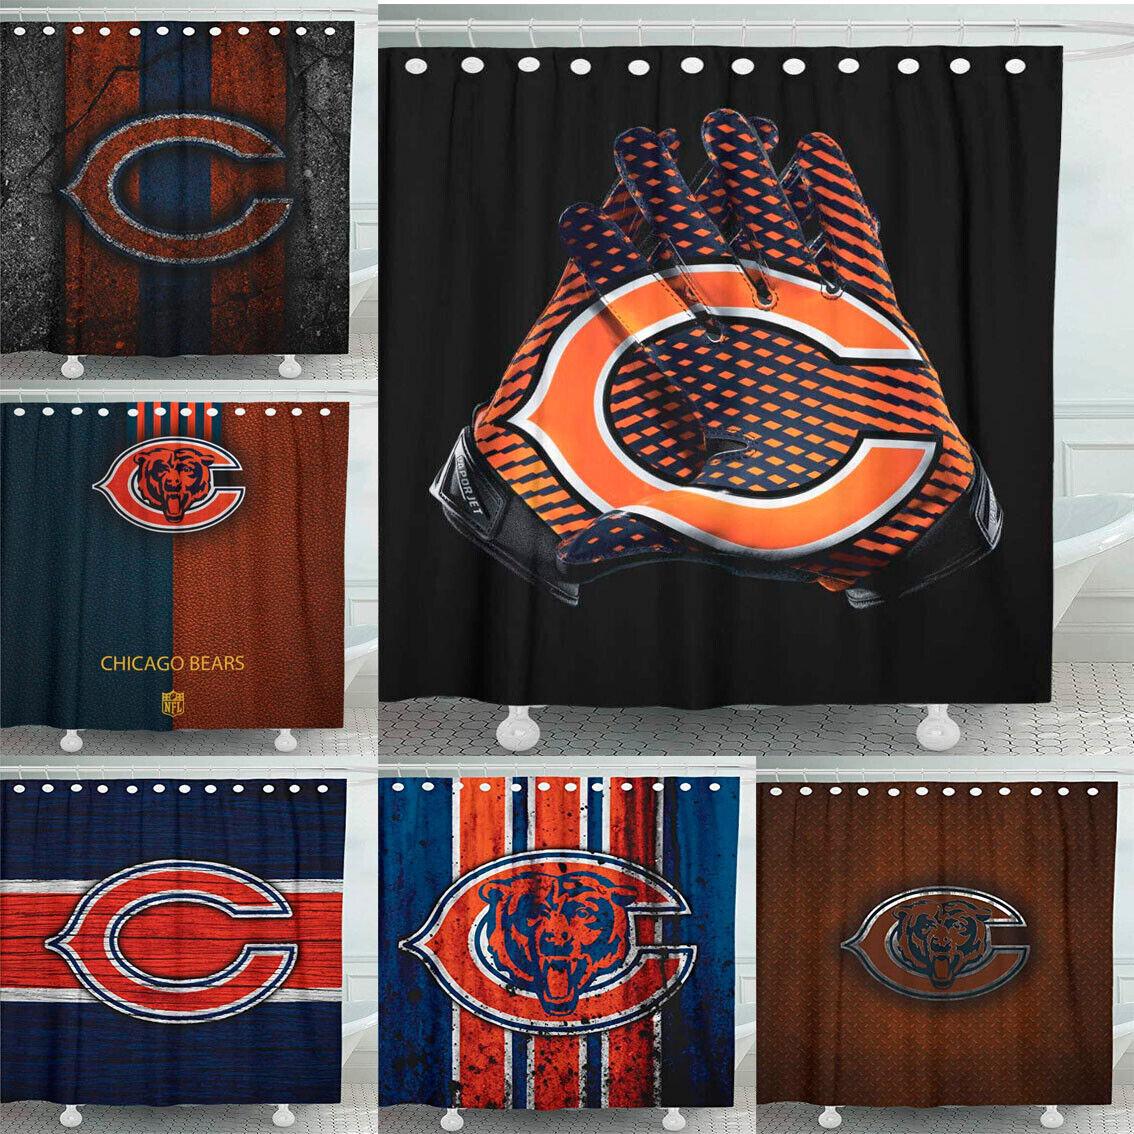 chicago bears fans 72 x 72 waterproof bathroom shower curtain accessory set